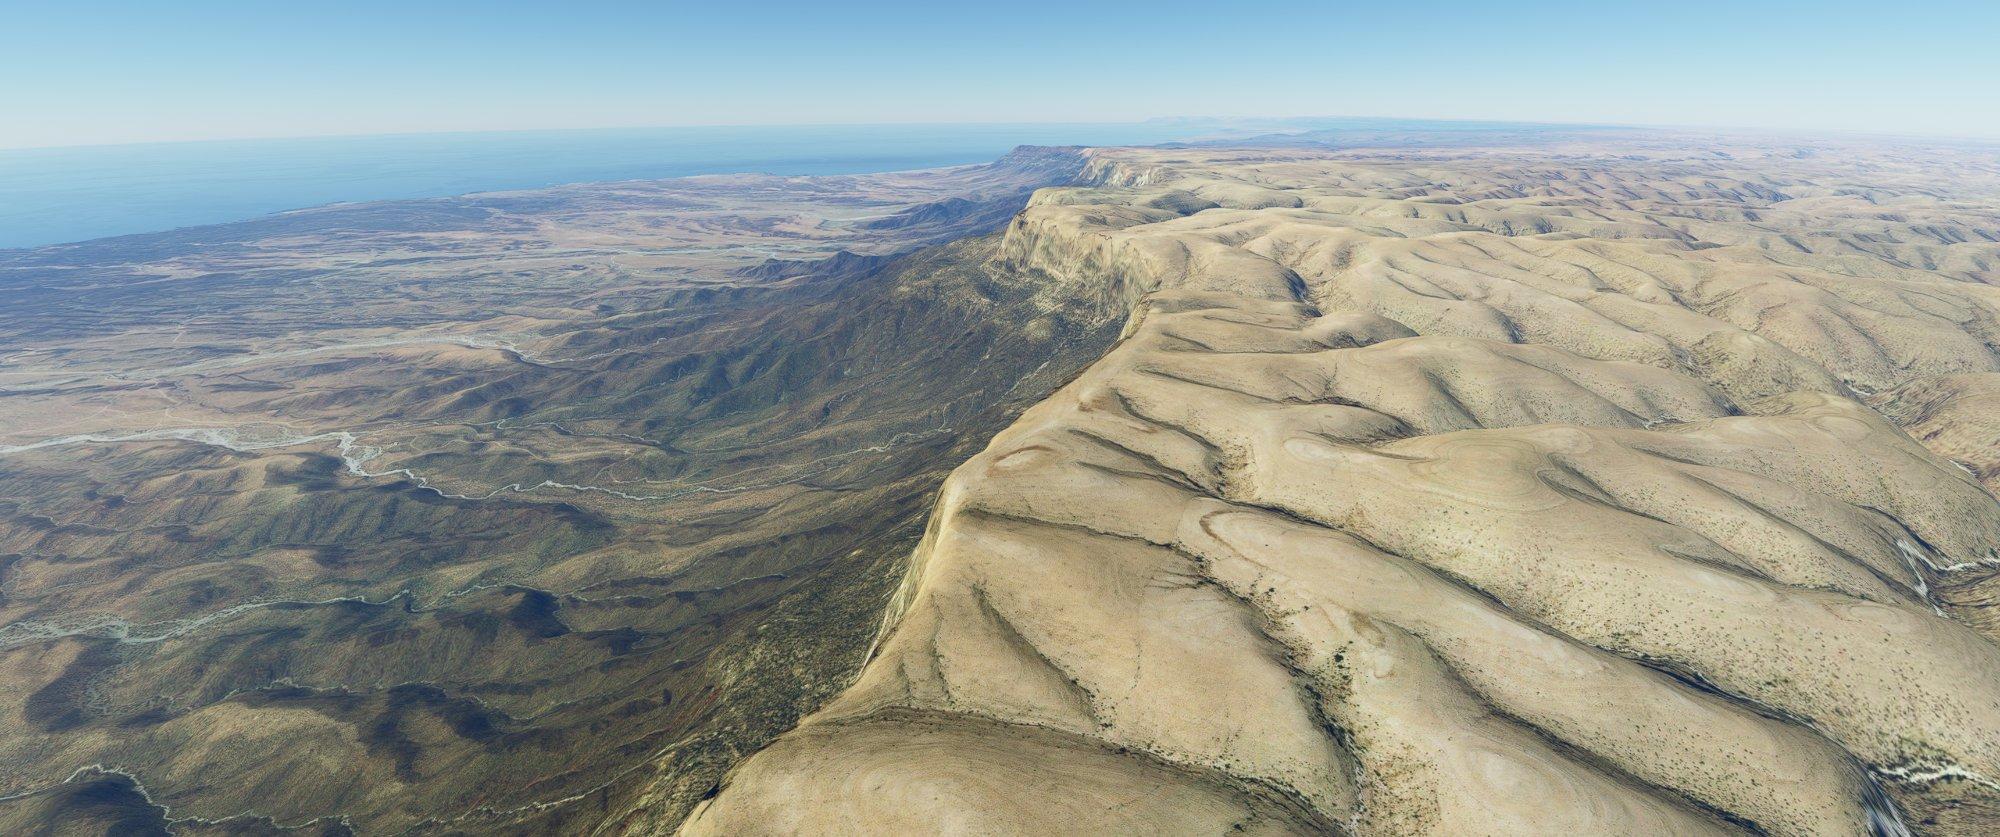 Microsoft Flight Simulator Screenshot 2020.12.18 - 14.29.50.74.jpg